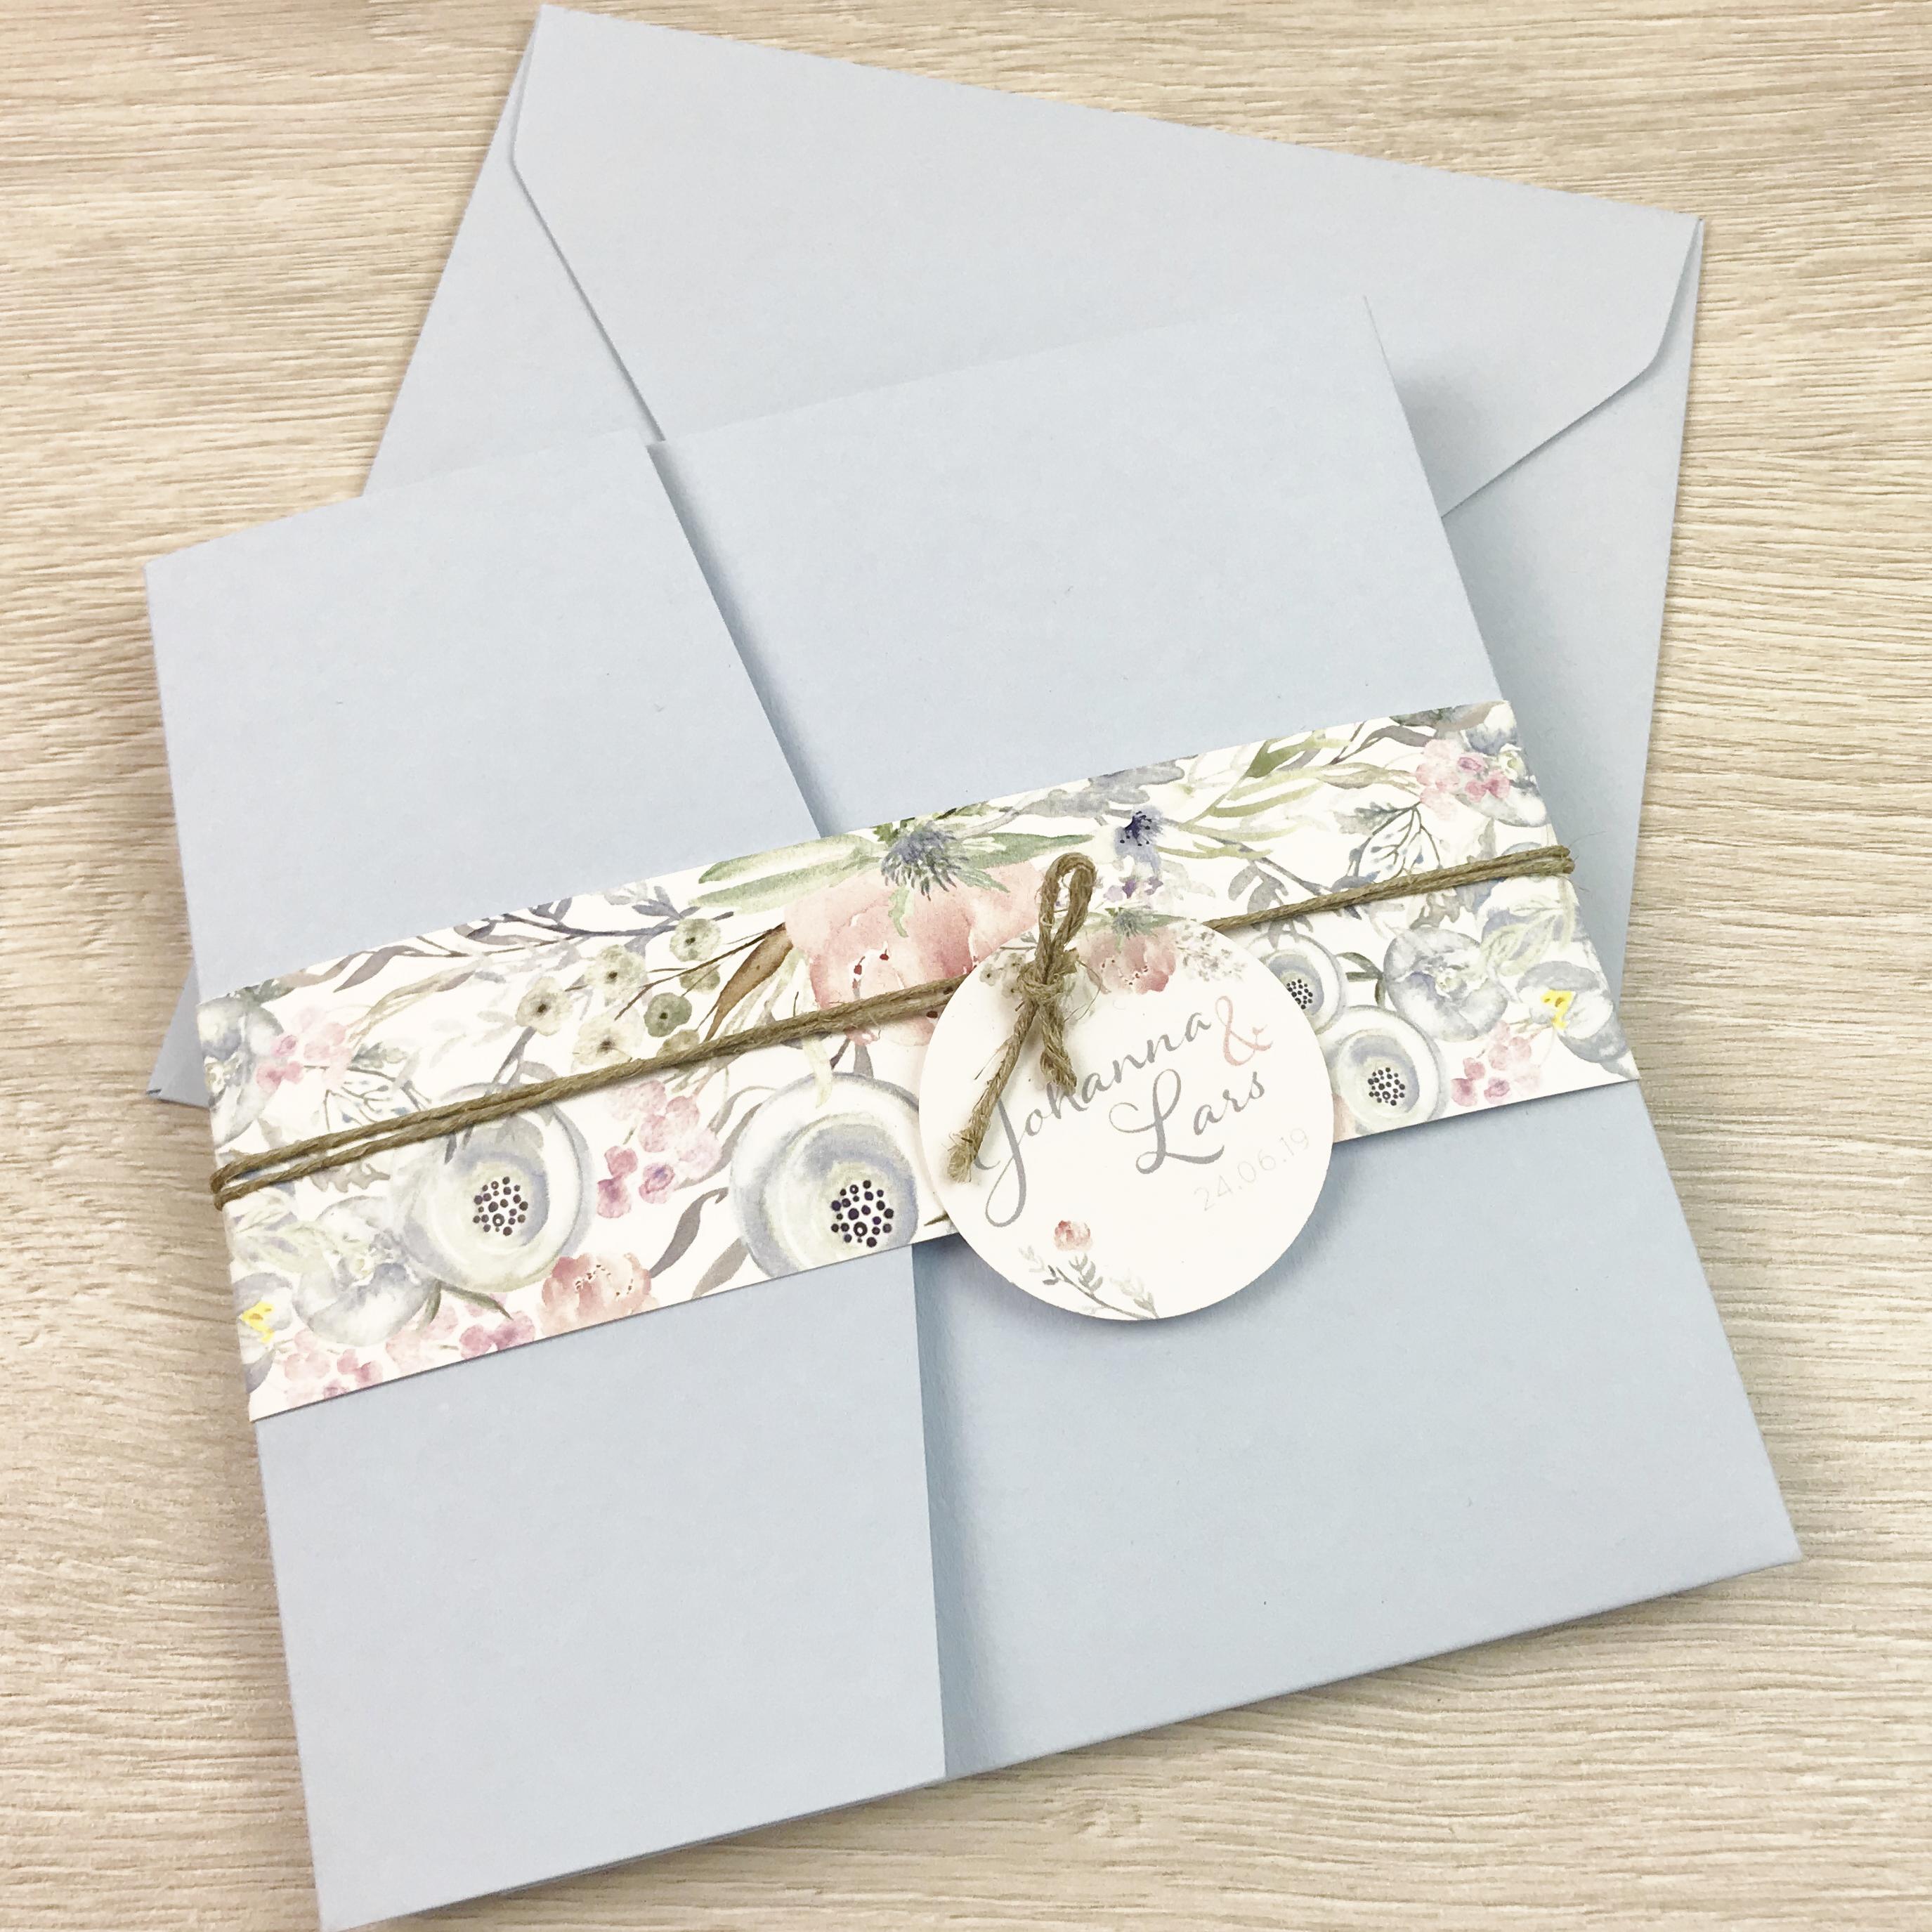 Einladung - Pocket Taubenblau